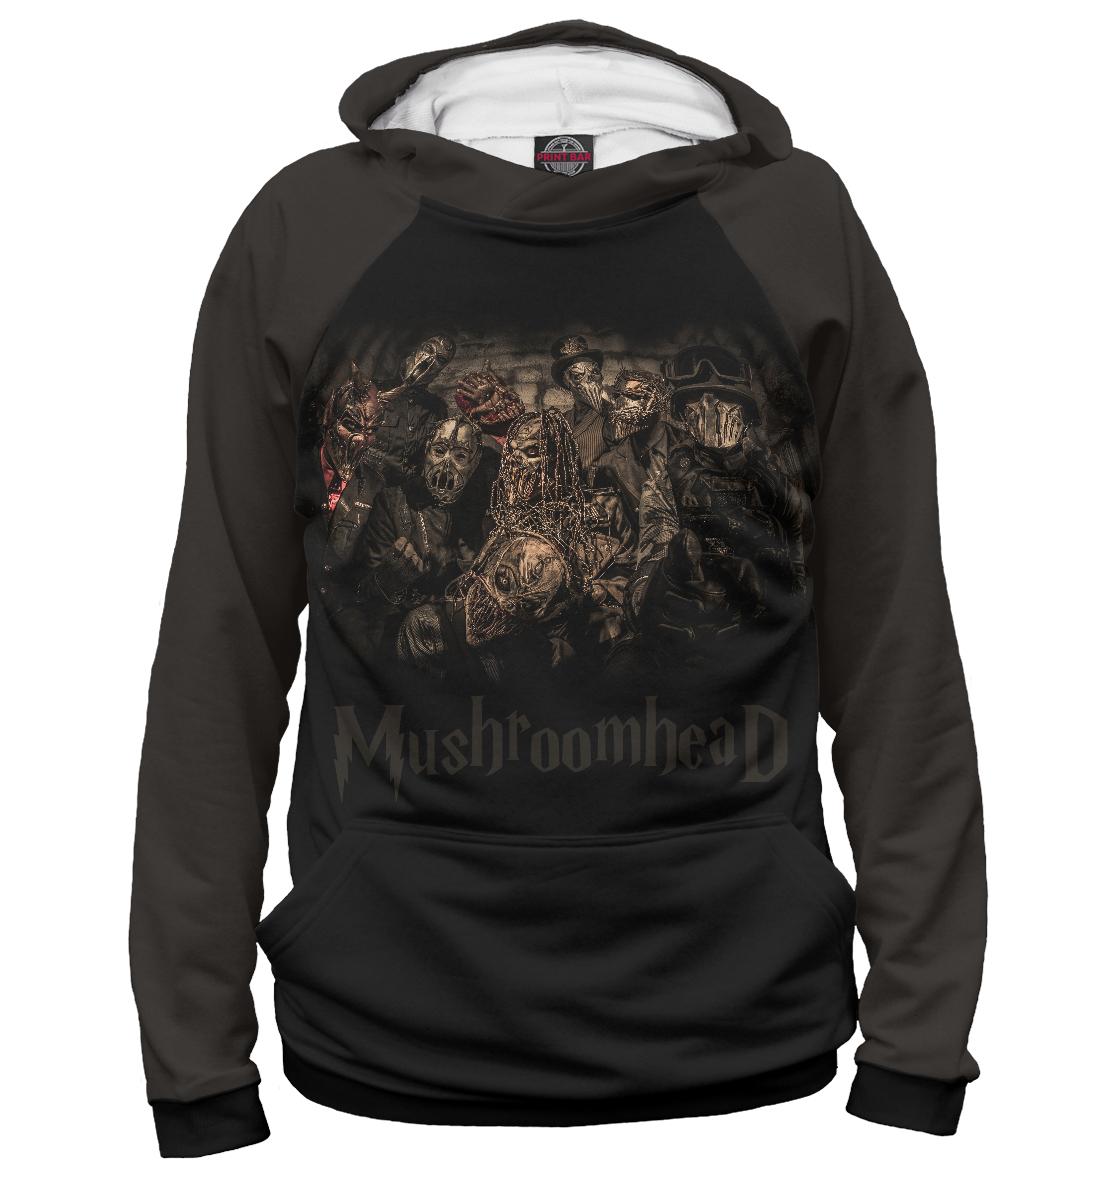 Купить Mushroomhead, Printbar, Худи, MZK-765875-hud-2